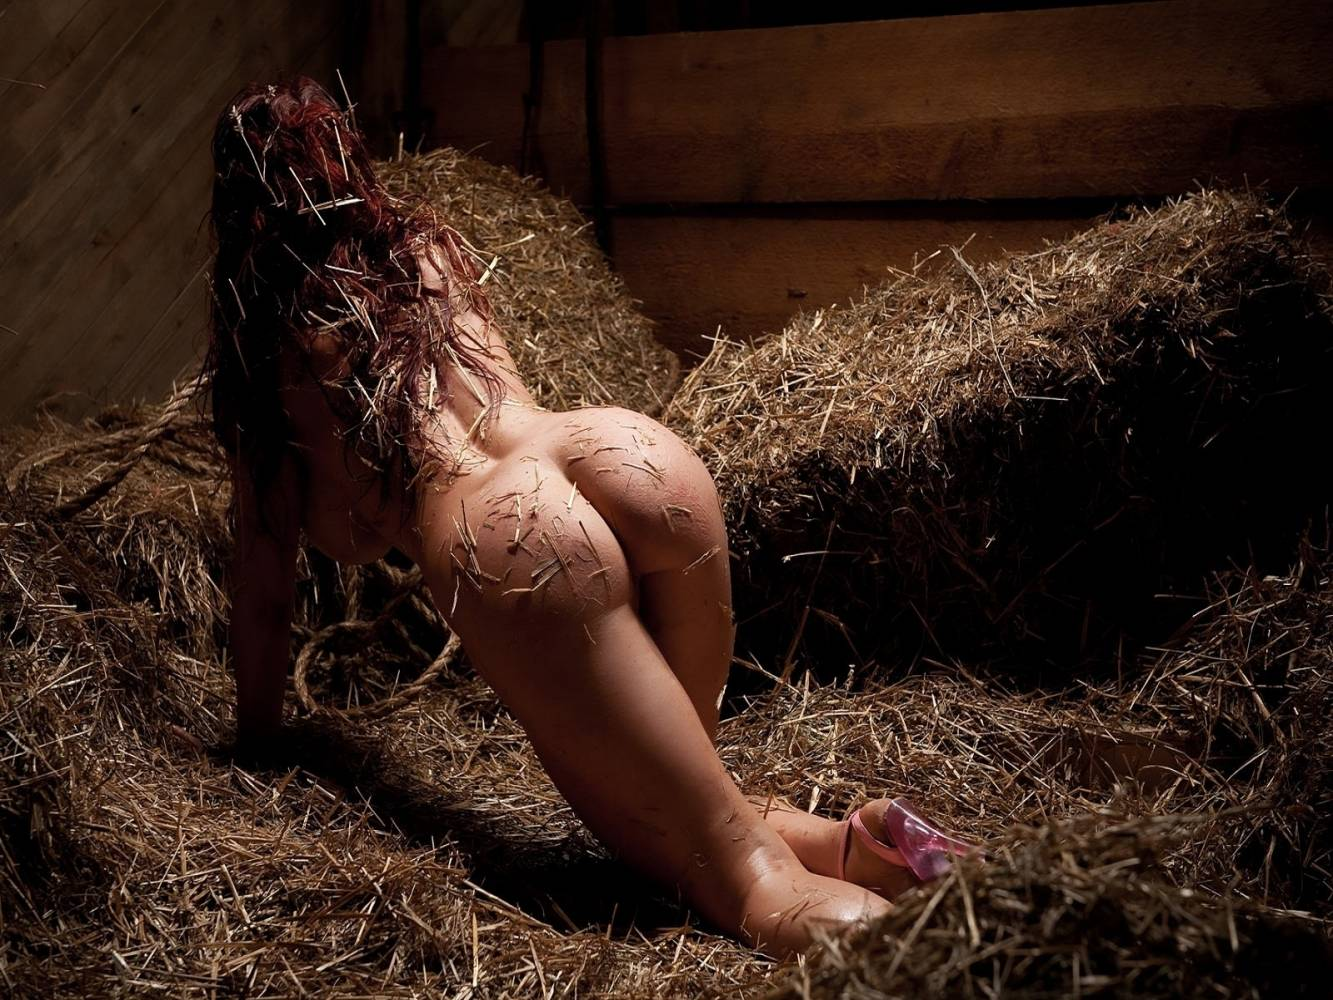 Секси женщина в конюшне фото 8 фотография